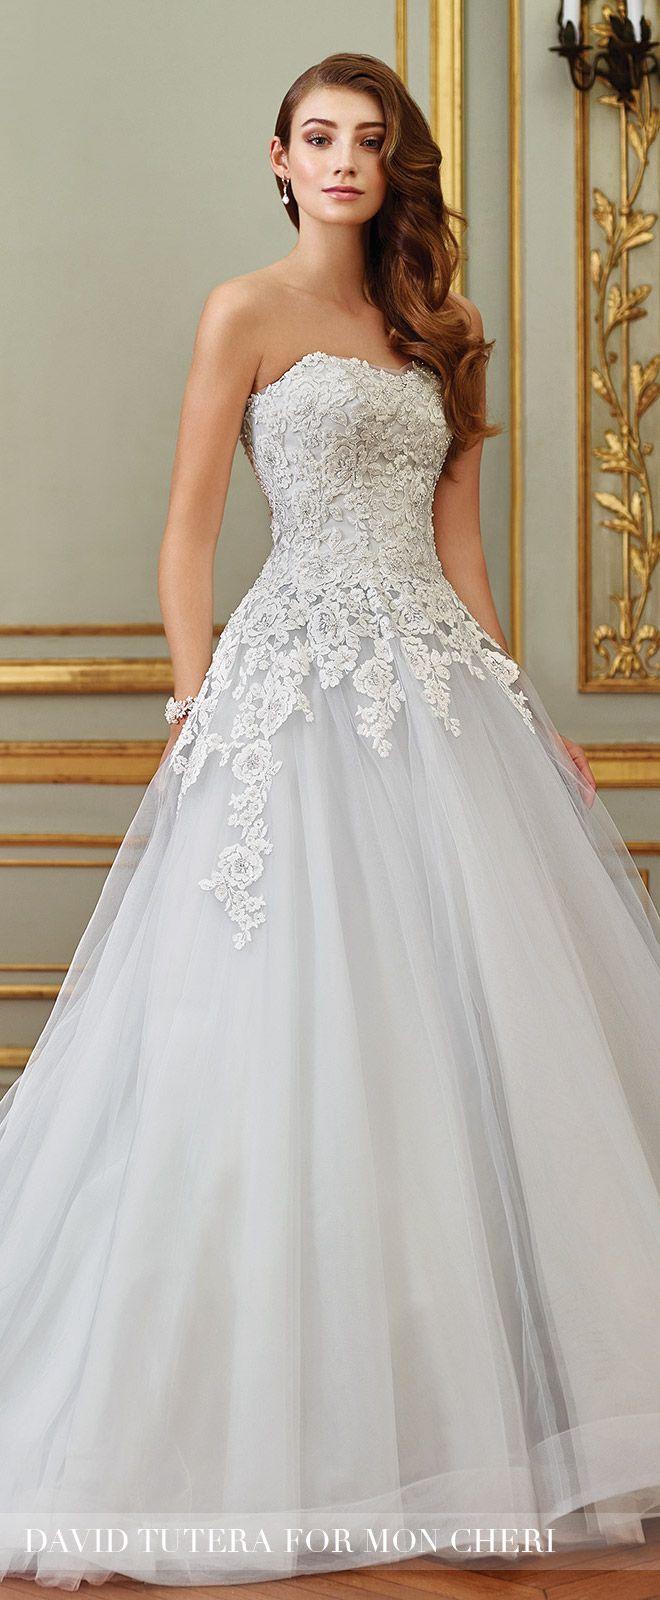 1000 ideas about Cute Dresses on Pinterest  Fashion Online Maxi Dresses and Mini Dresses